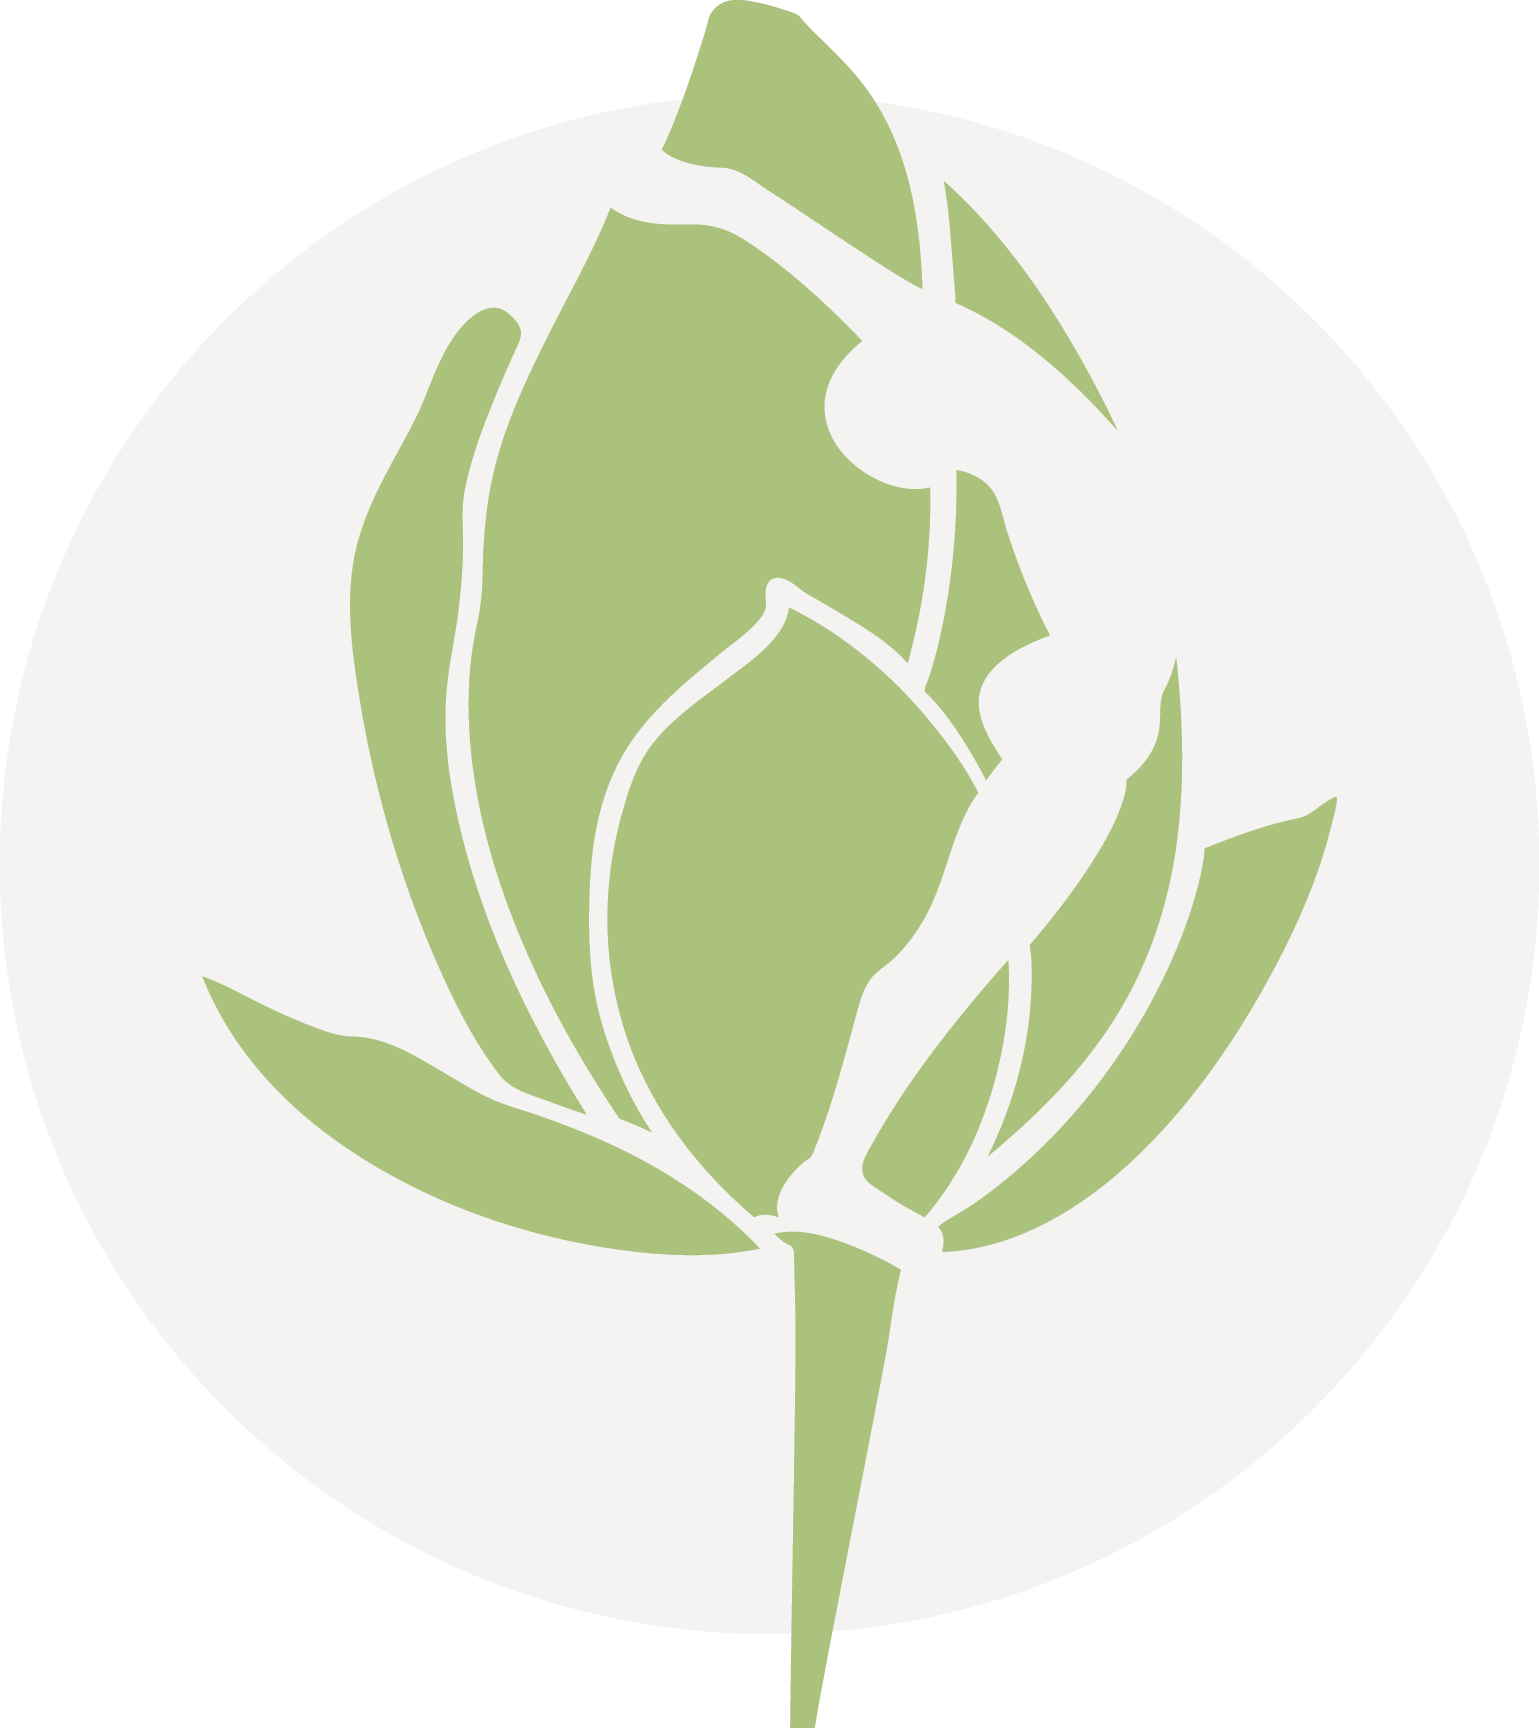 Yoga santosha icon green